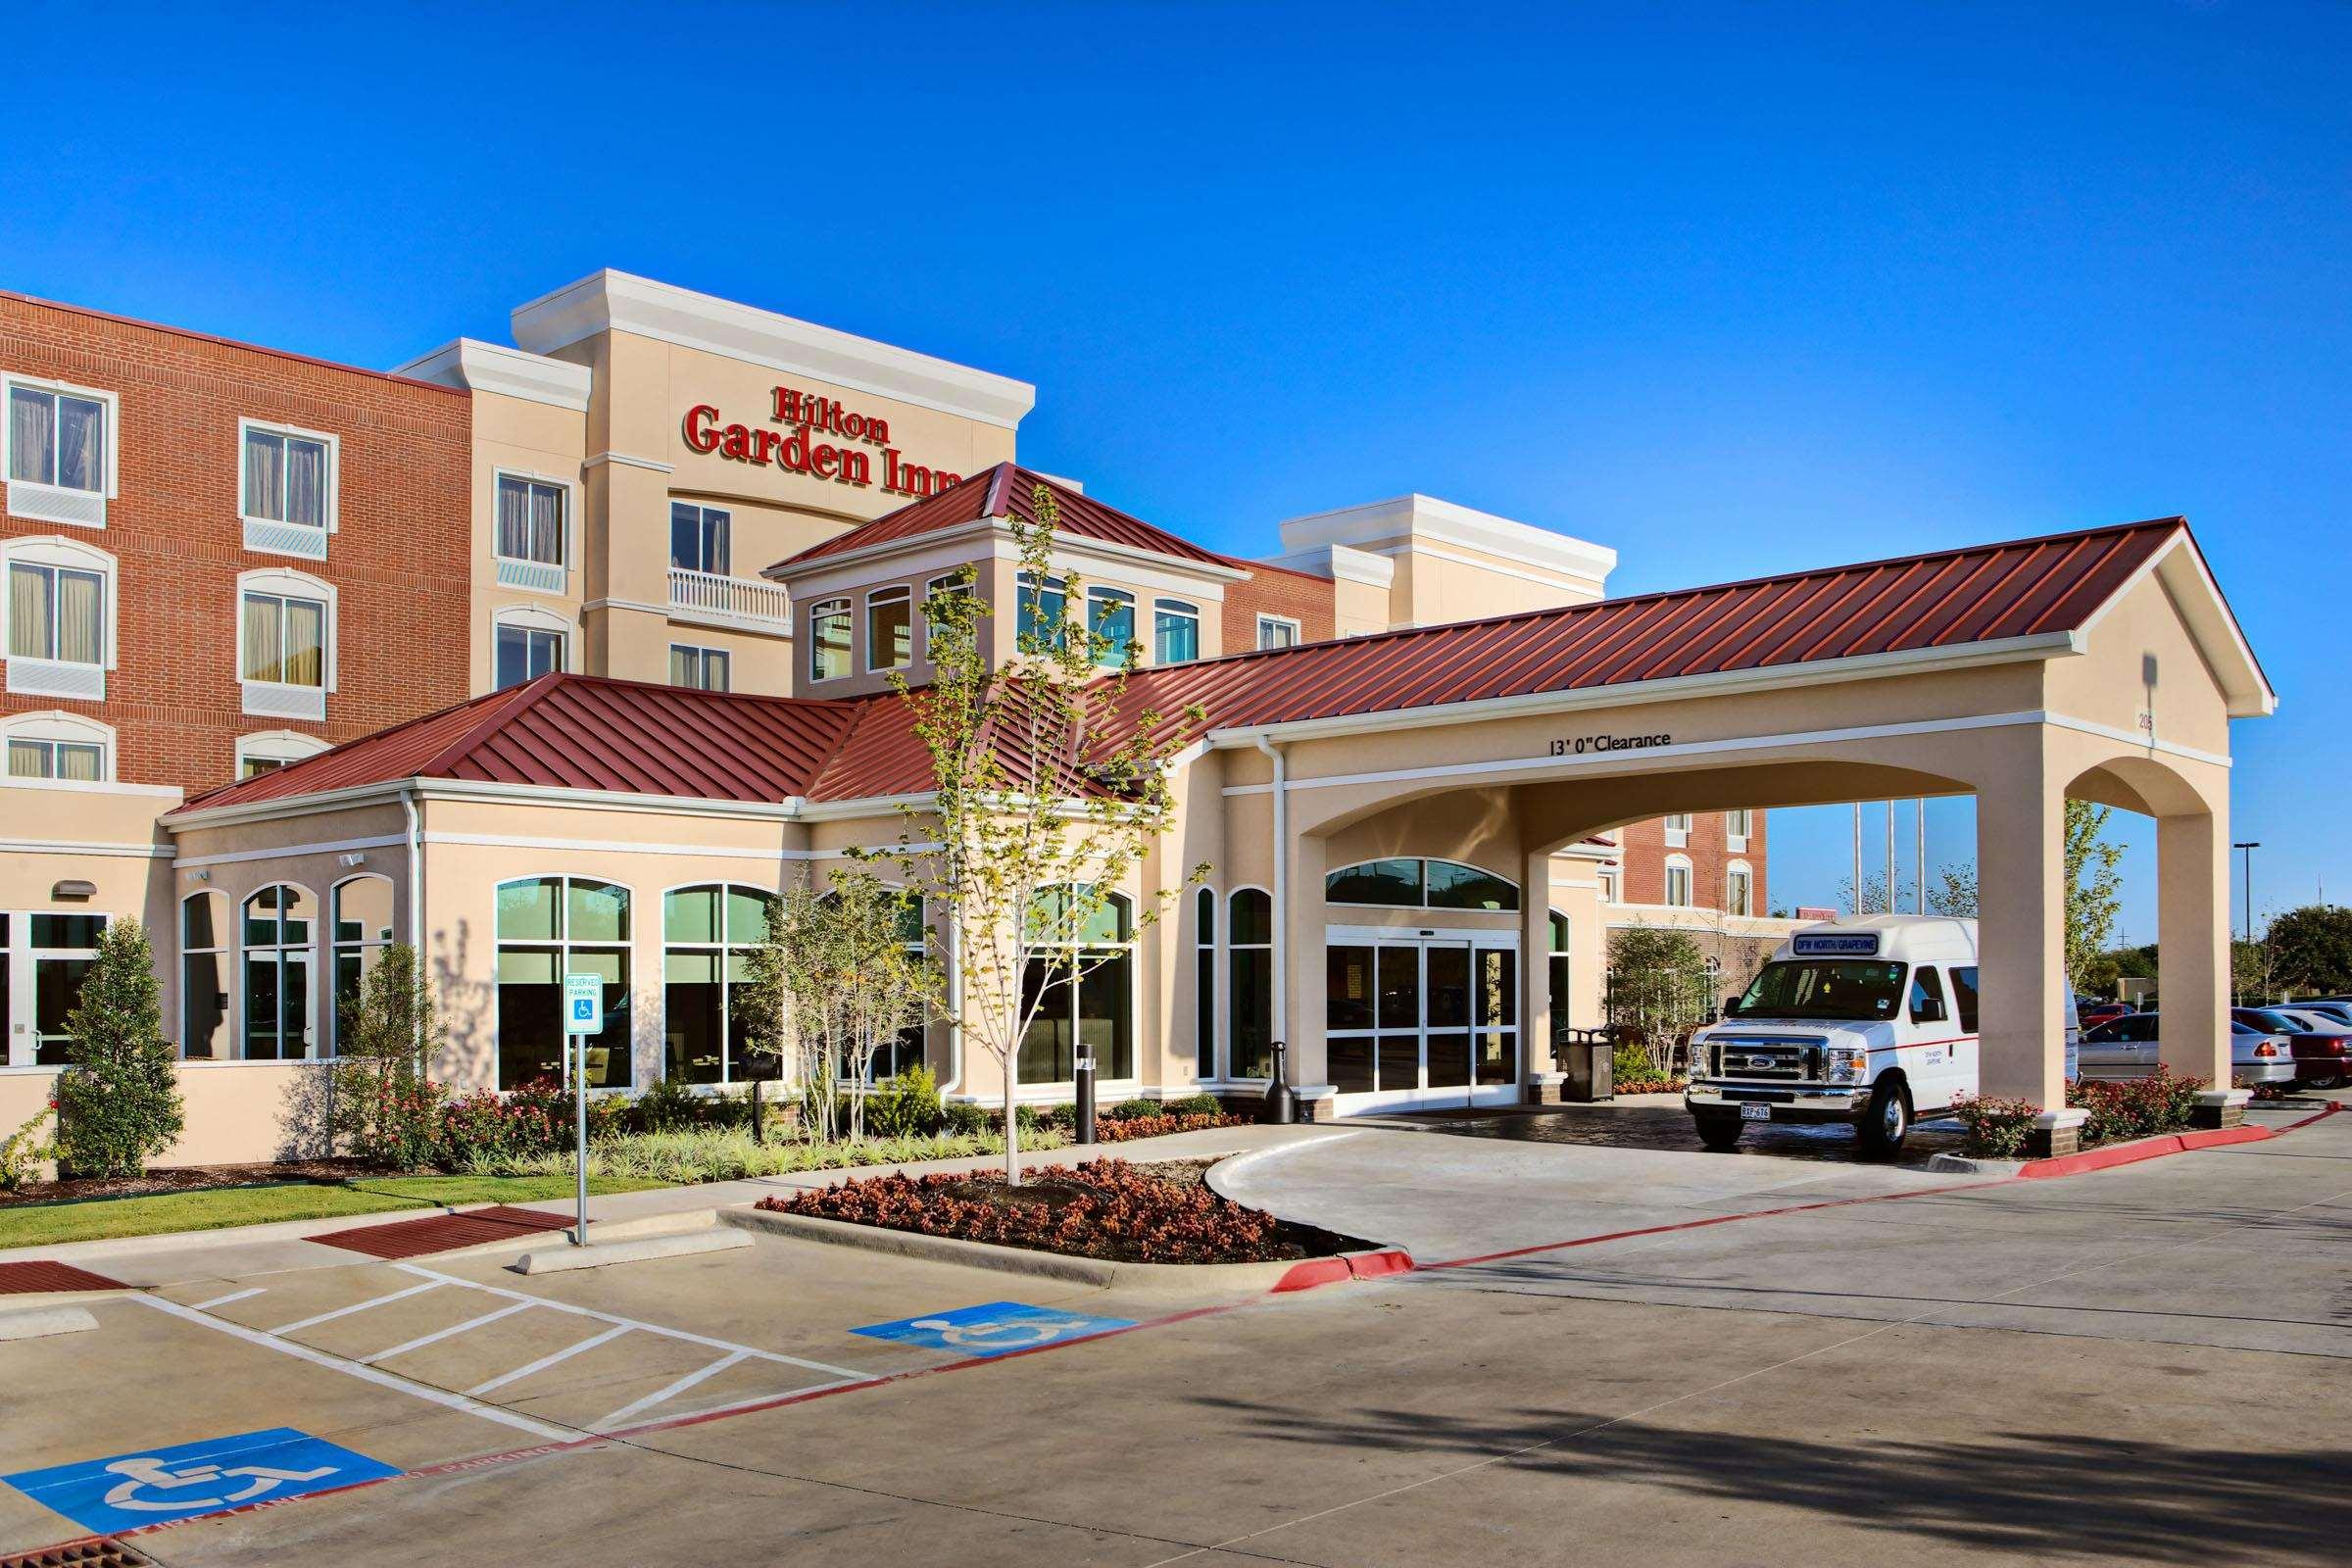 Hilton Garden Inn DFW North Grapevine image 4